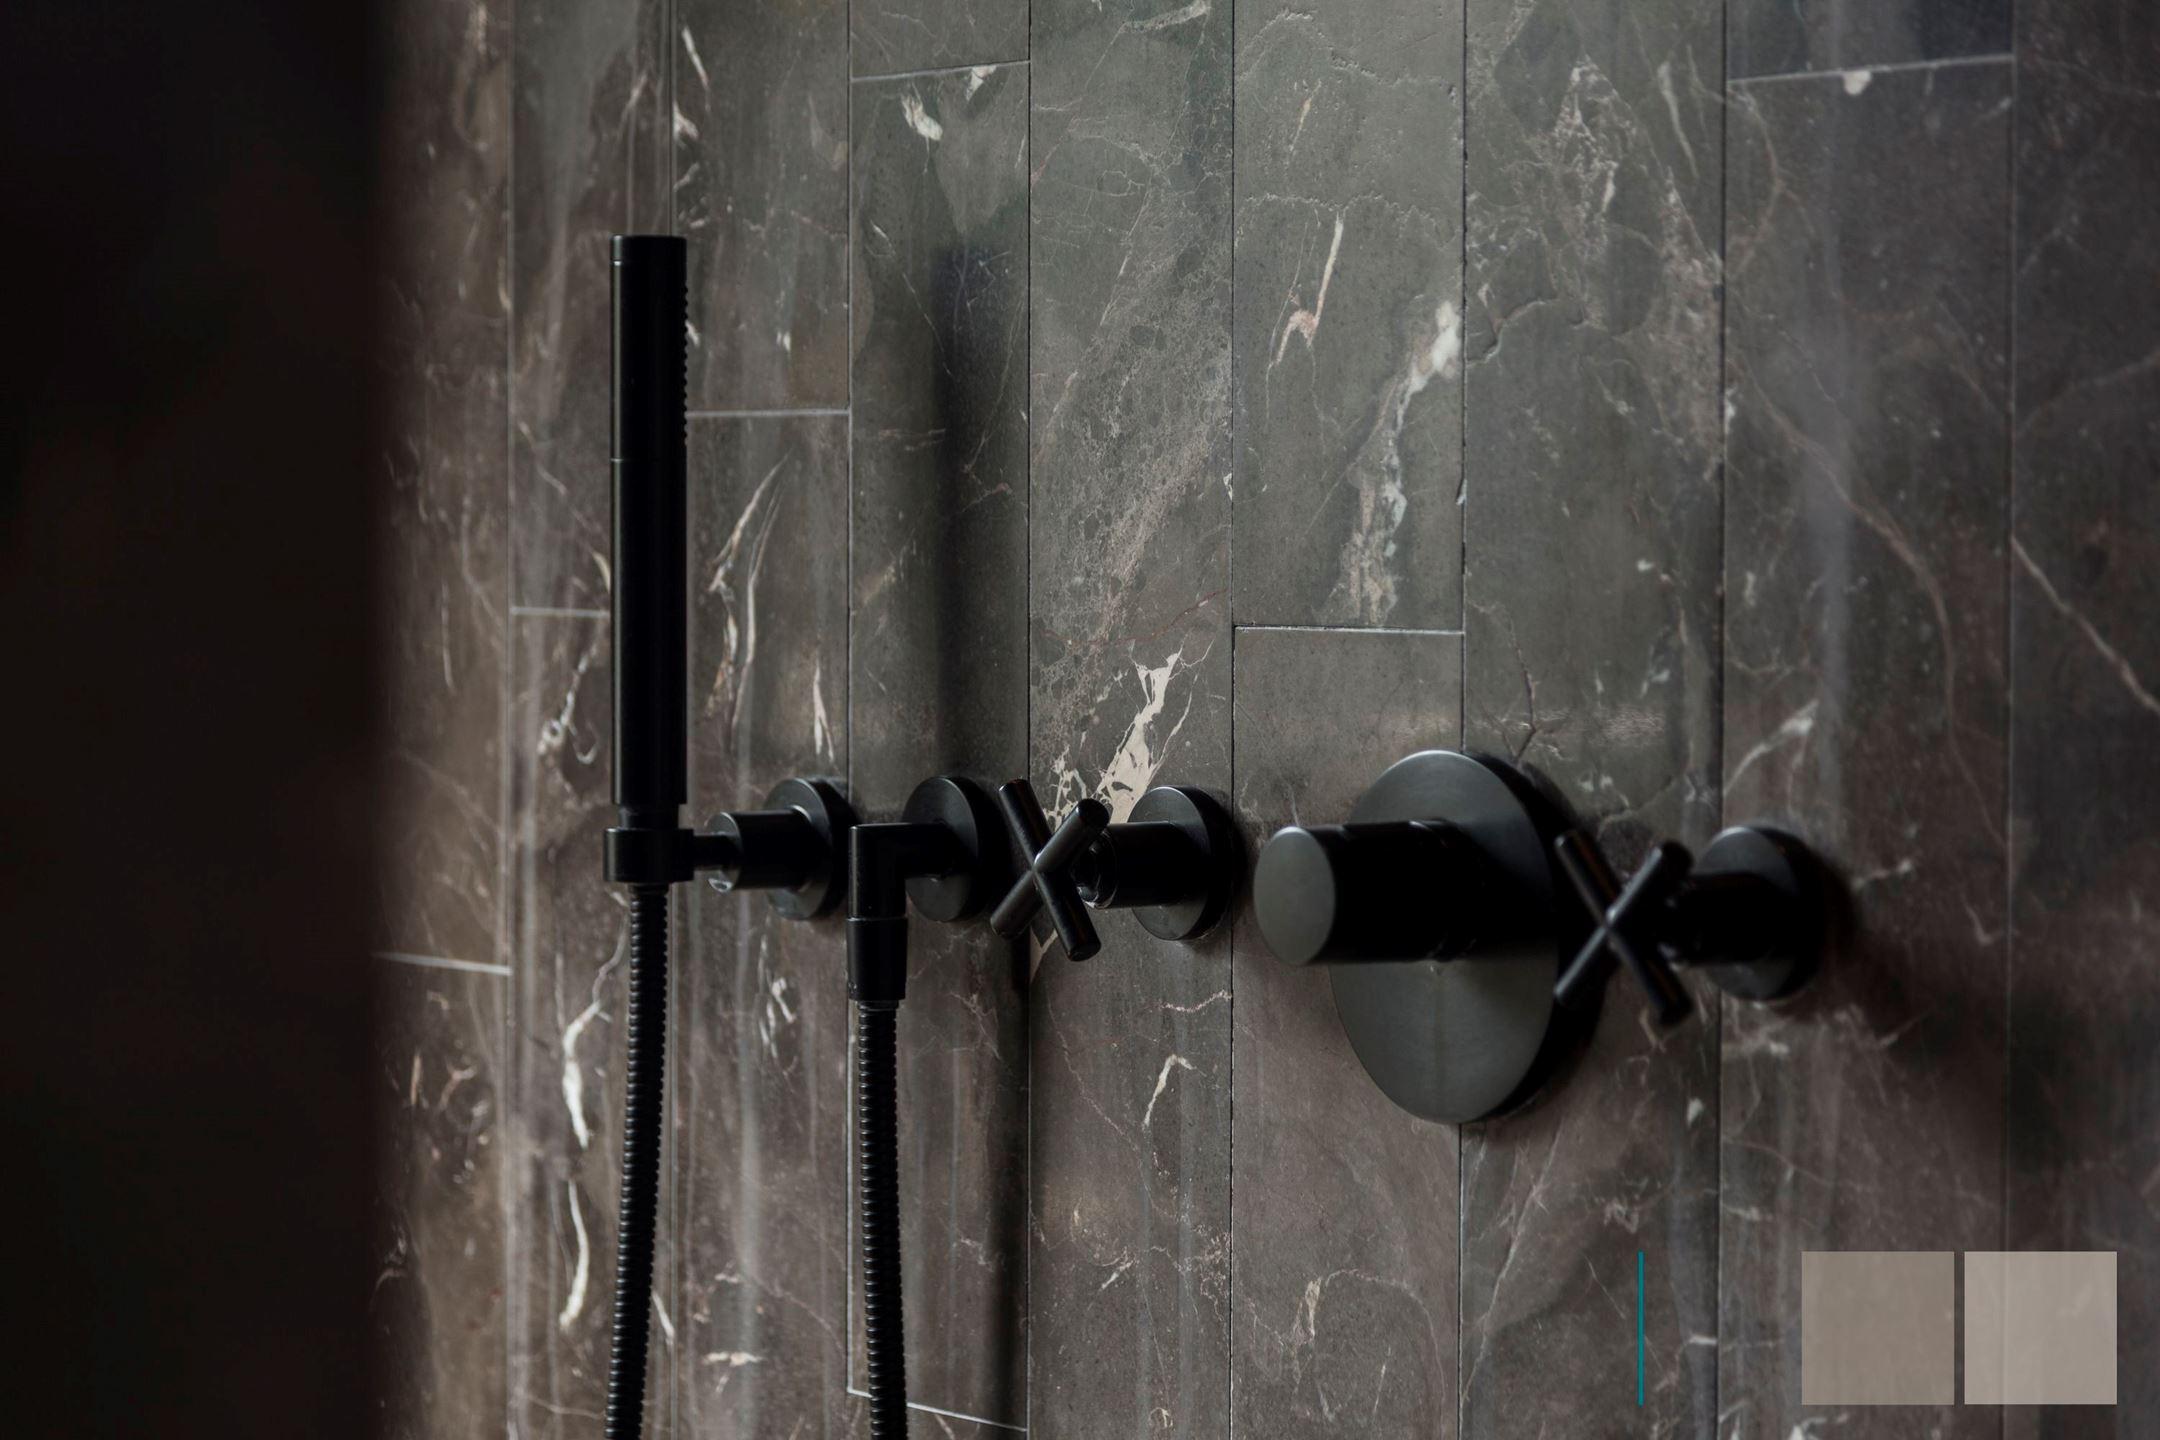 душ смеситель плитка мрамор